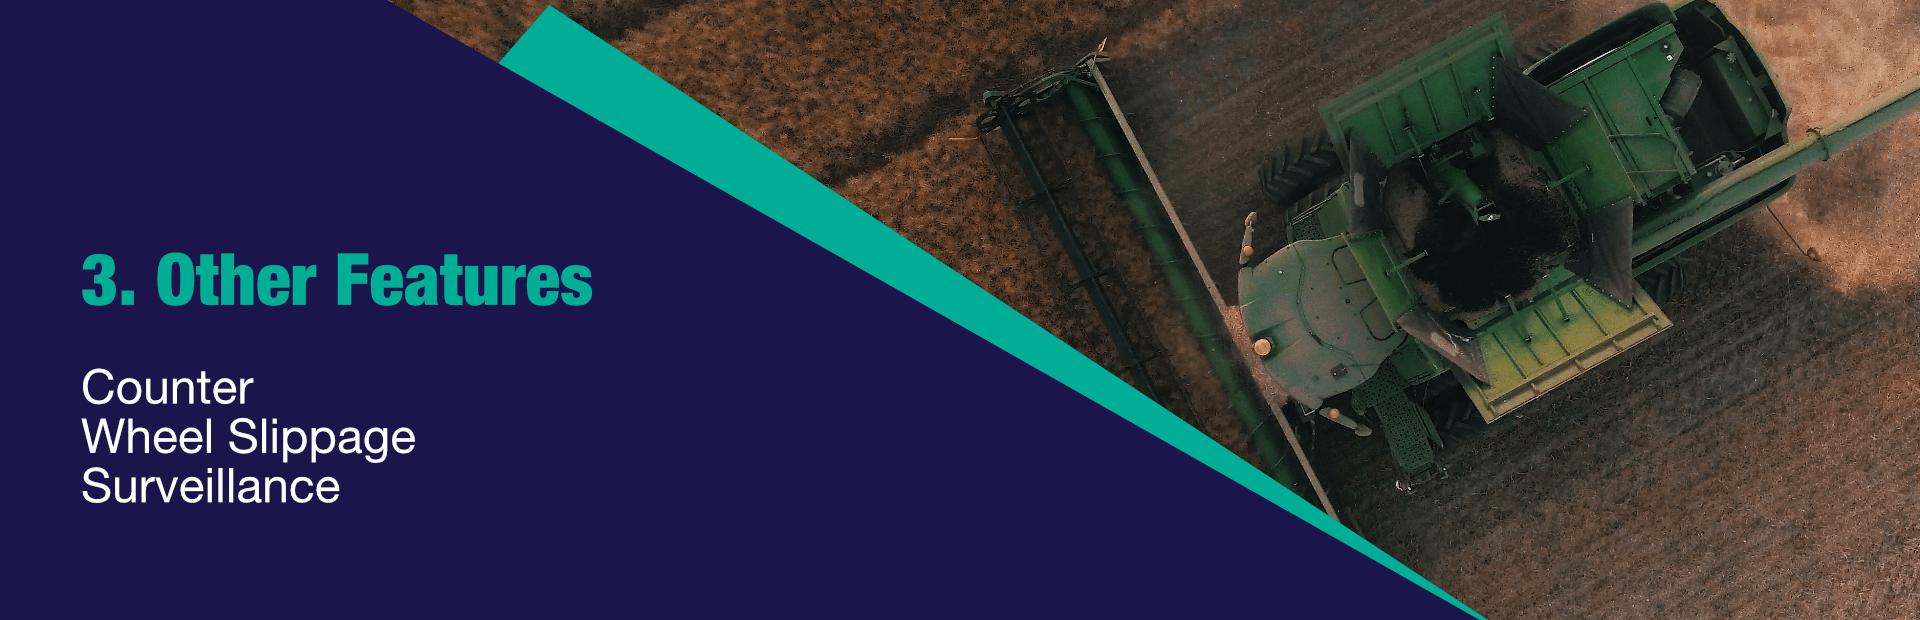 Jackal Farmscan SmartAG Systems agritech